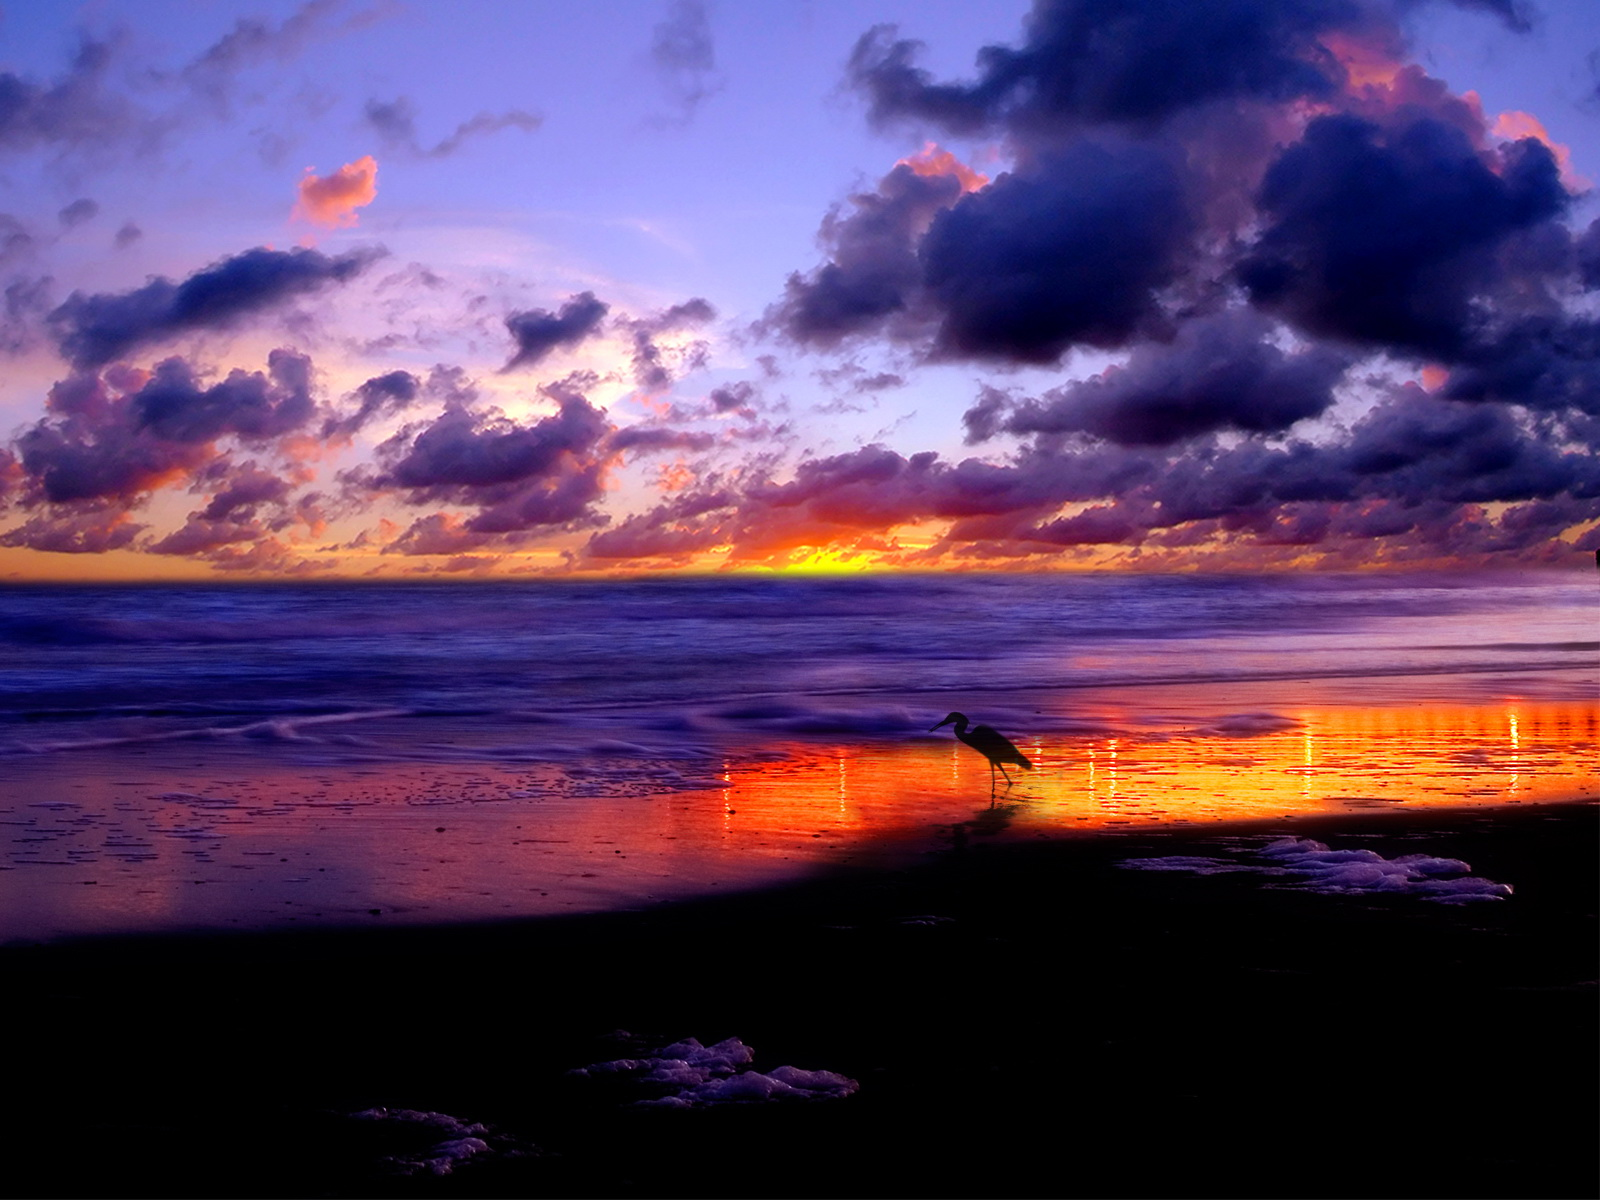 Pictures For World 写真自然に非常に大きな 大きな自然の背景